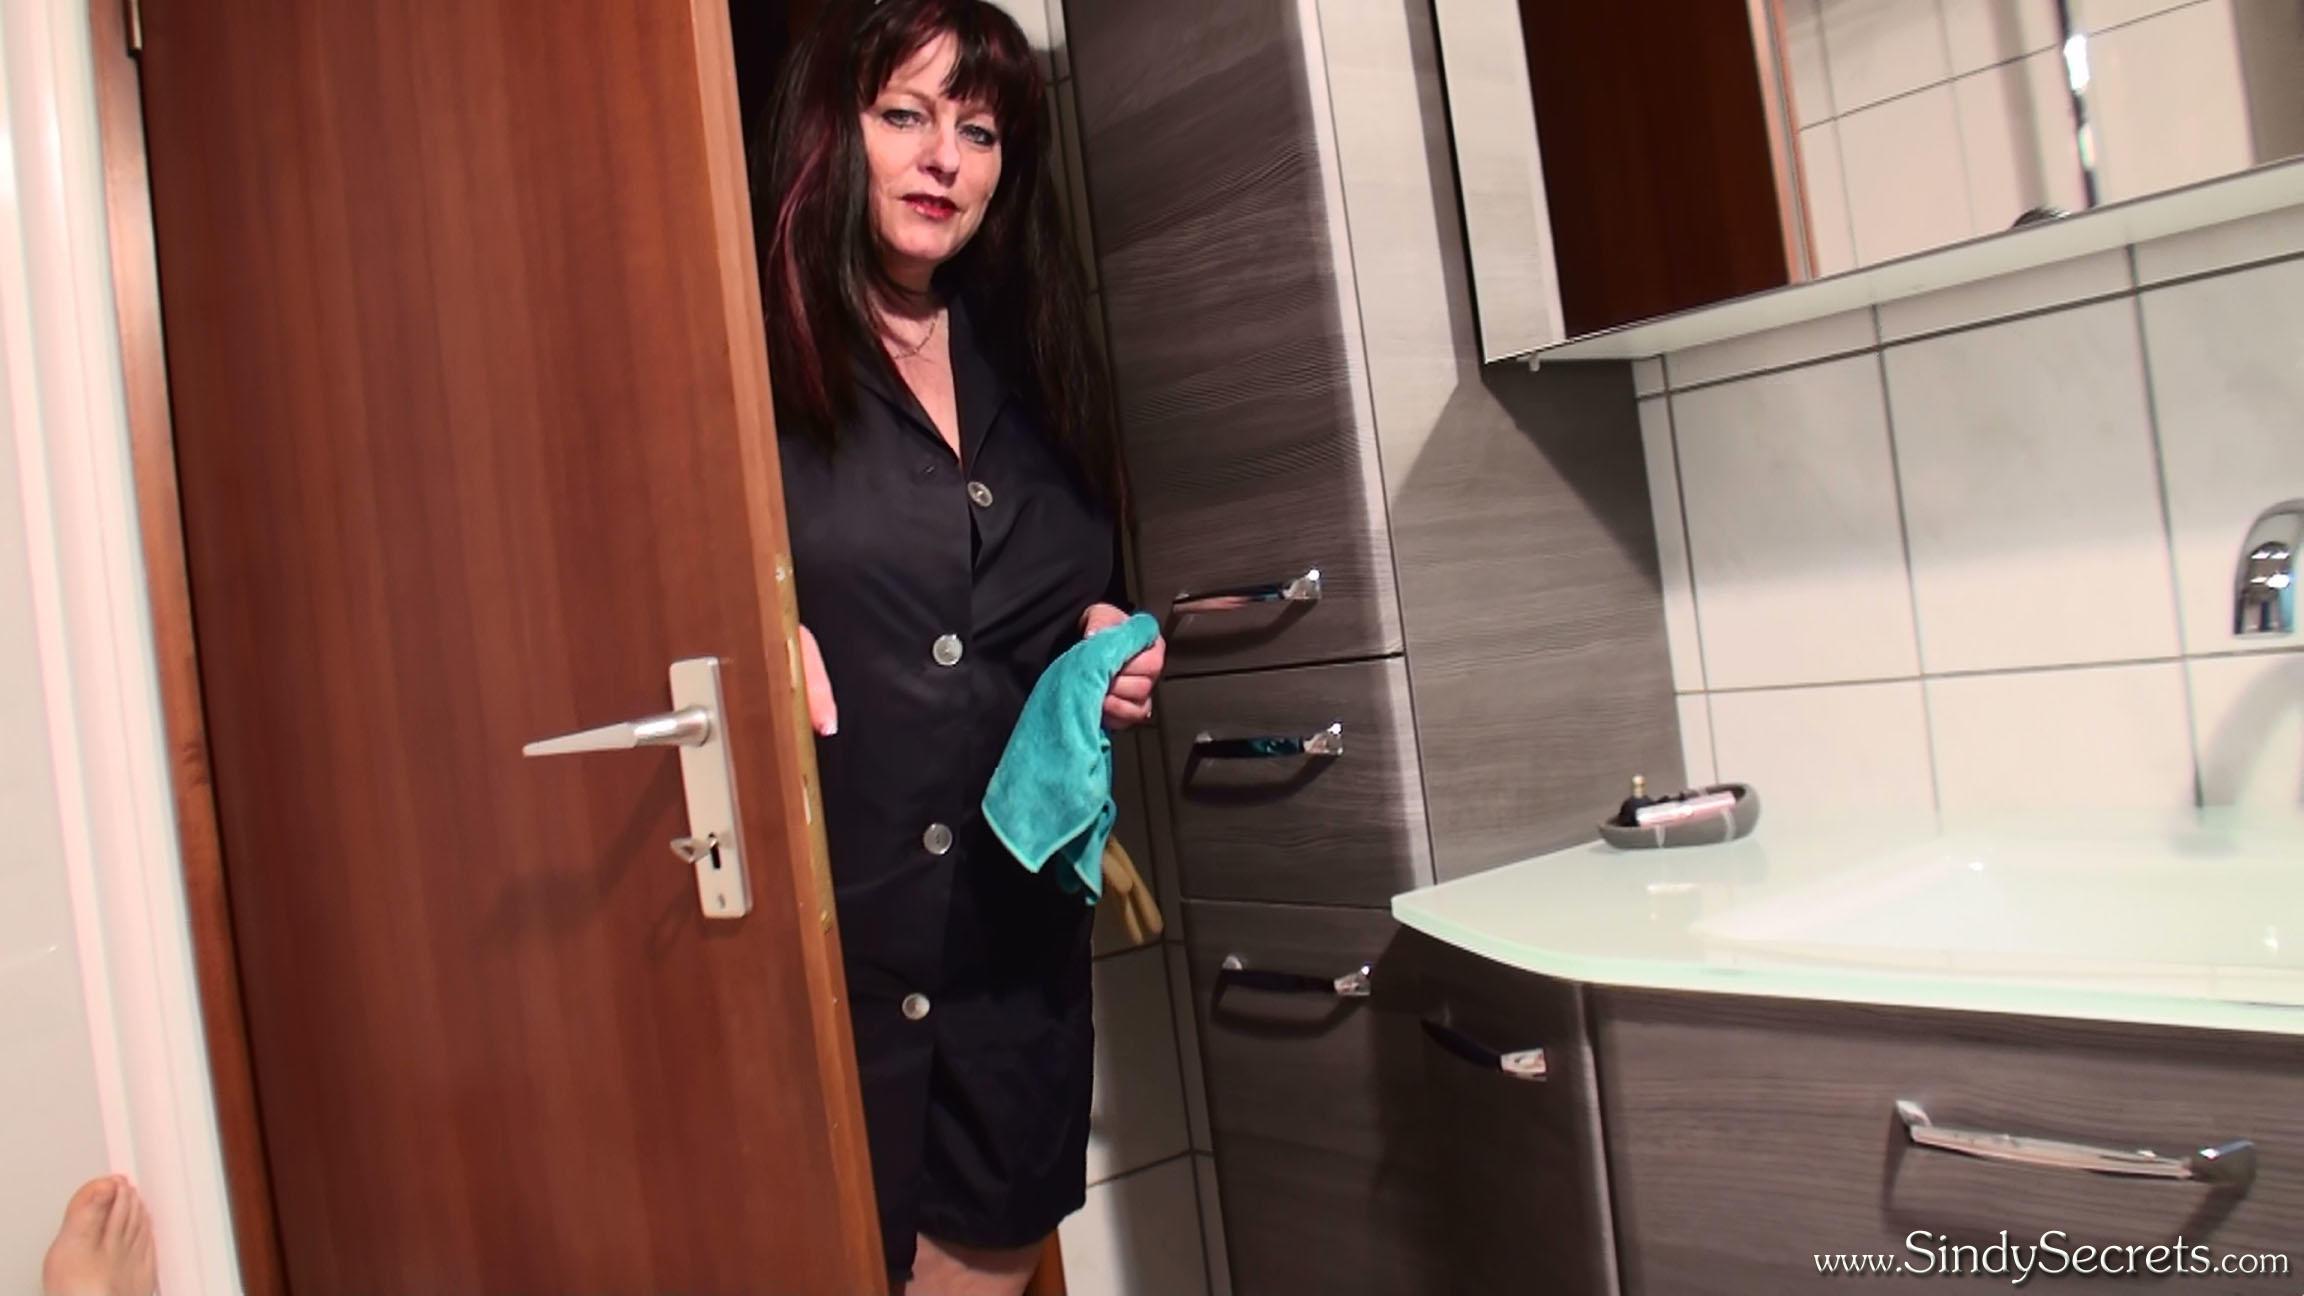 Sindy Secrets - Busty & Glovefetish | Gloved Handjob by Bath